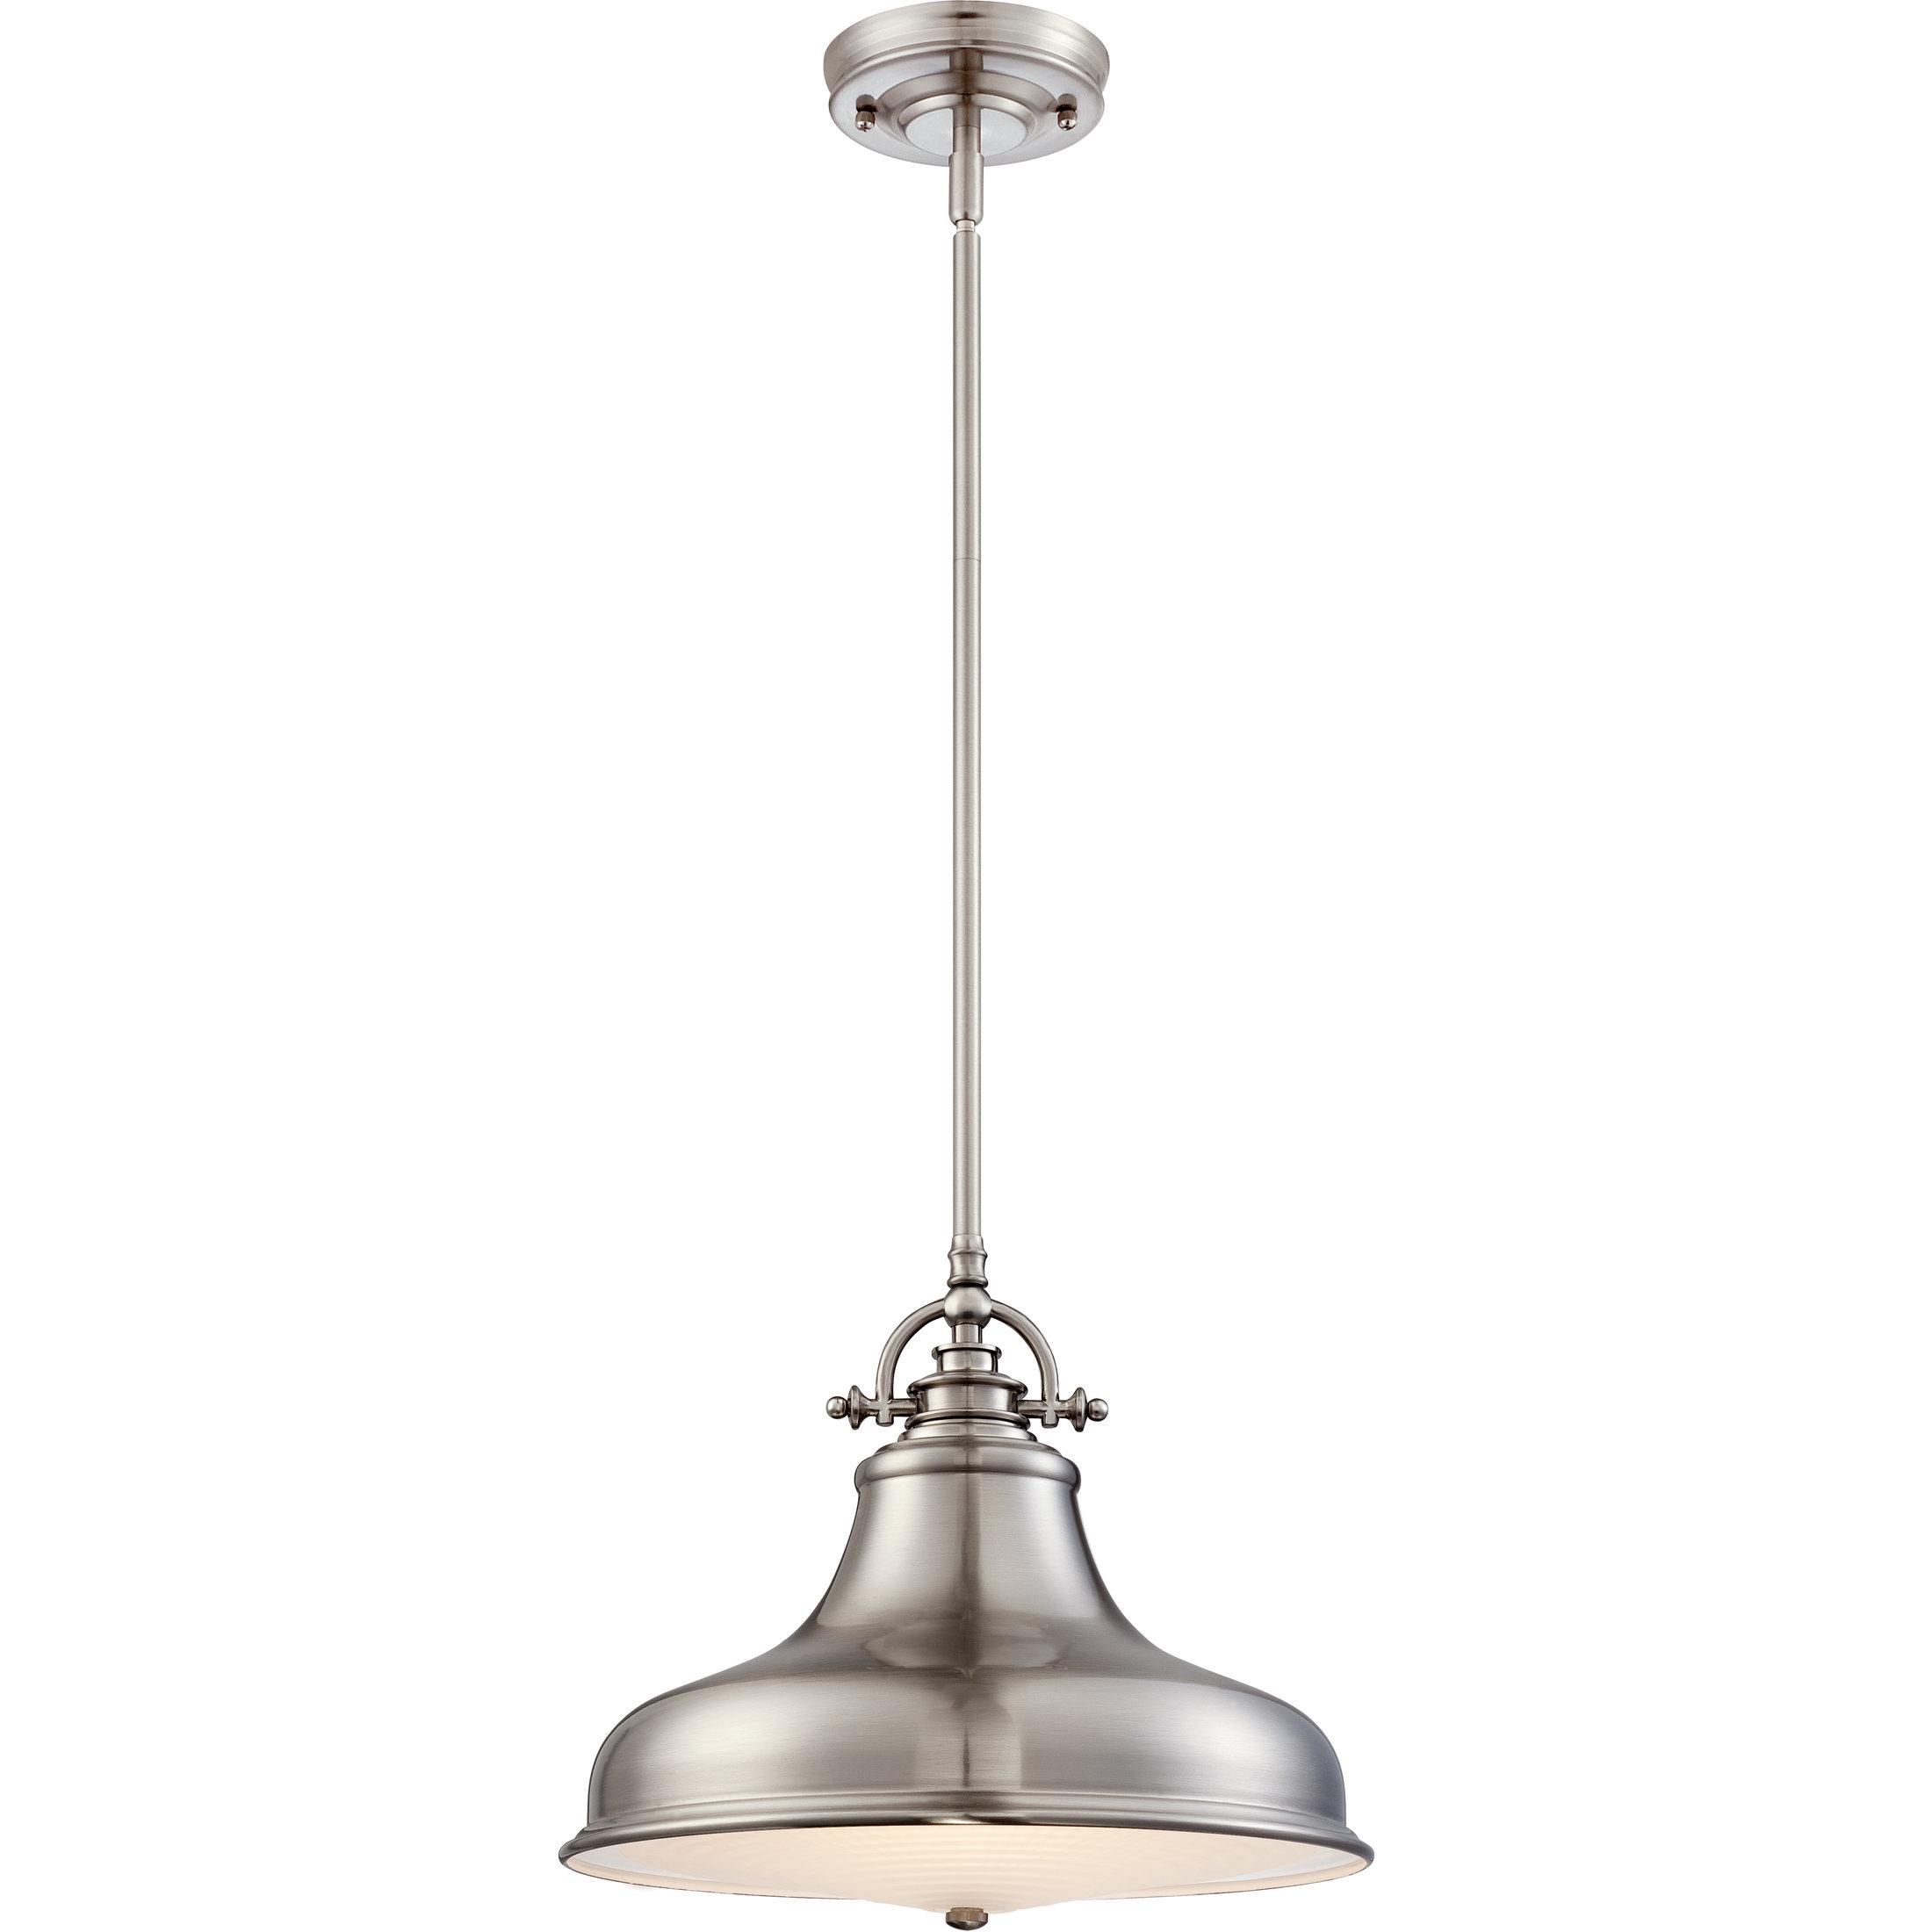 Ninette 1 Light Dome Pendants Pertaining To 2020 Mueller 1 Light Single Dome Pendant (Gallery 19 of 20)